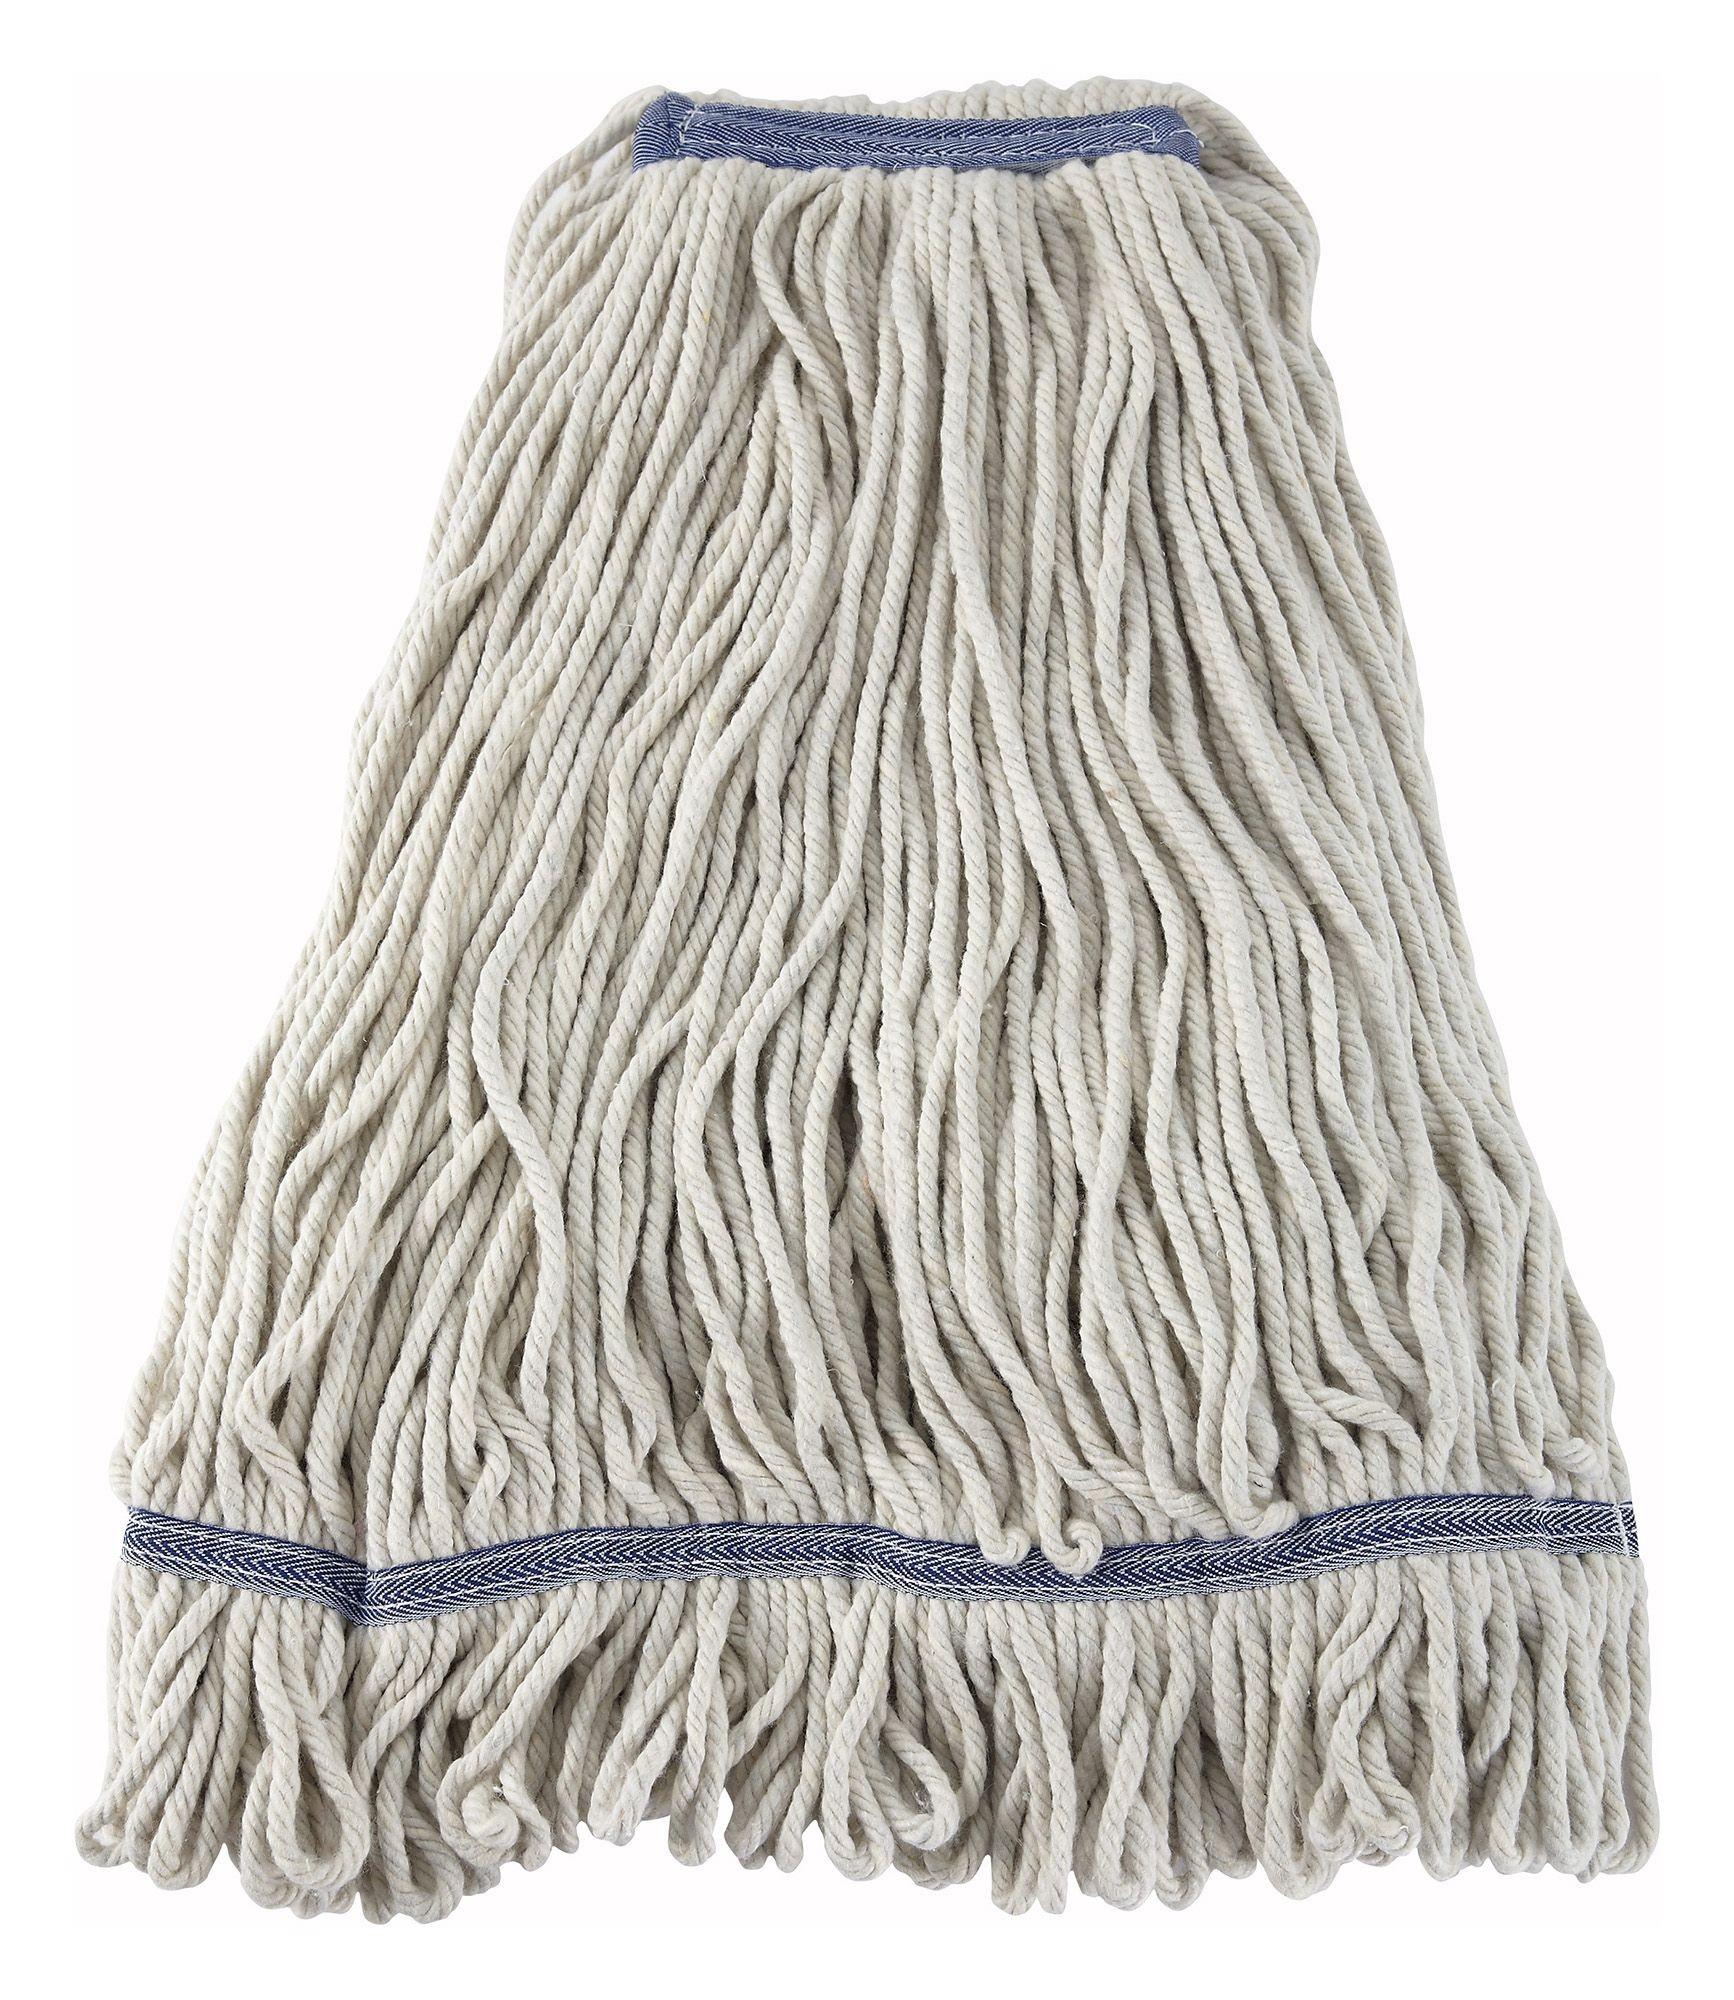 White Yarn 32 Oz. Looped-End Wet Mop Head - 800 G Capacity